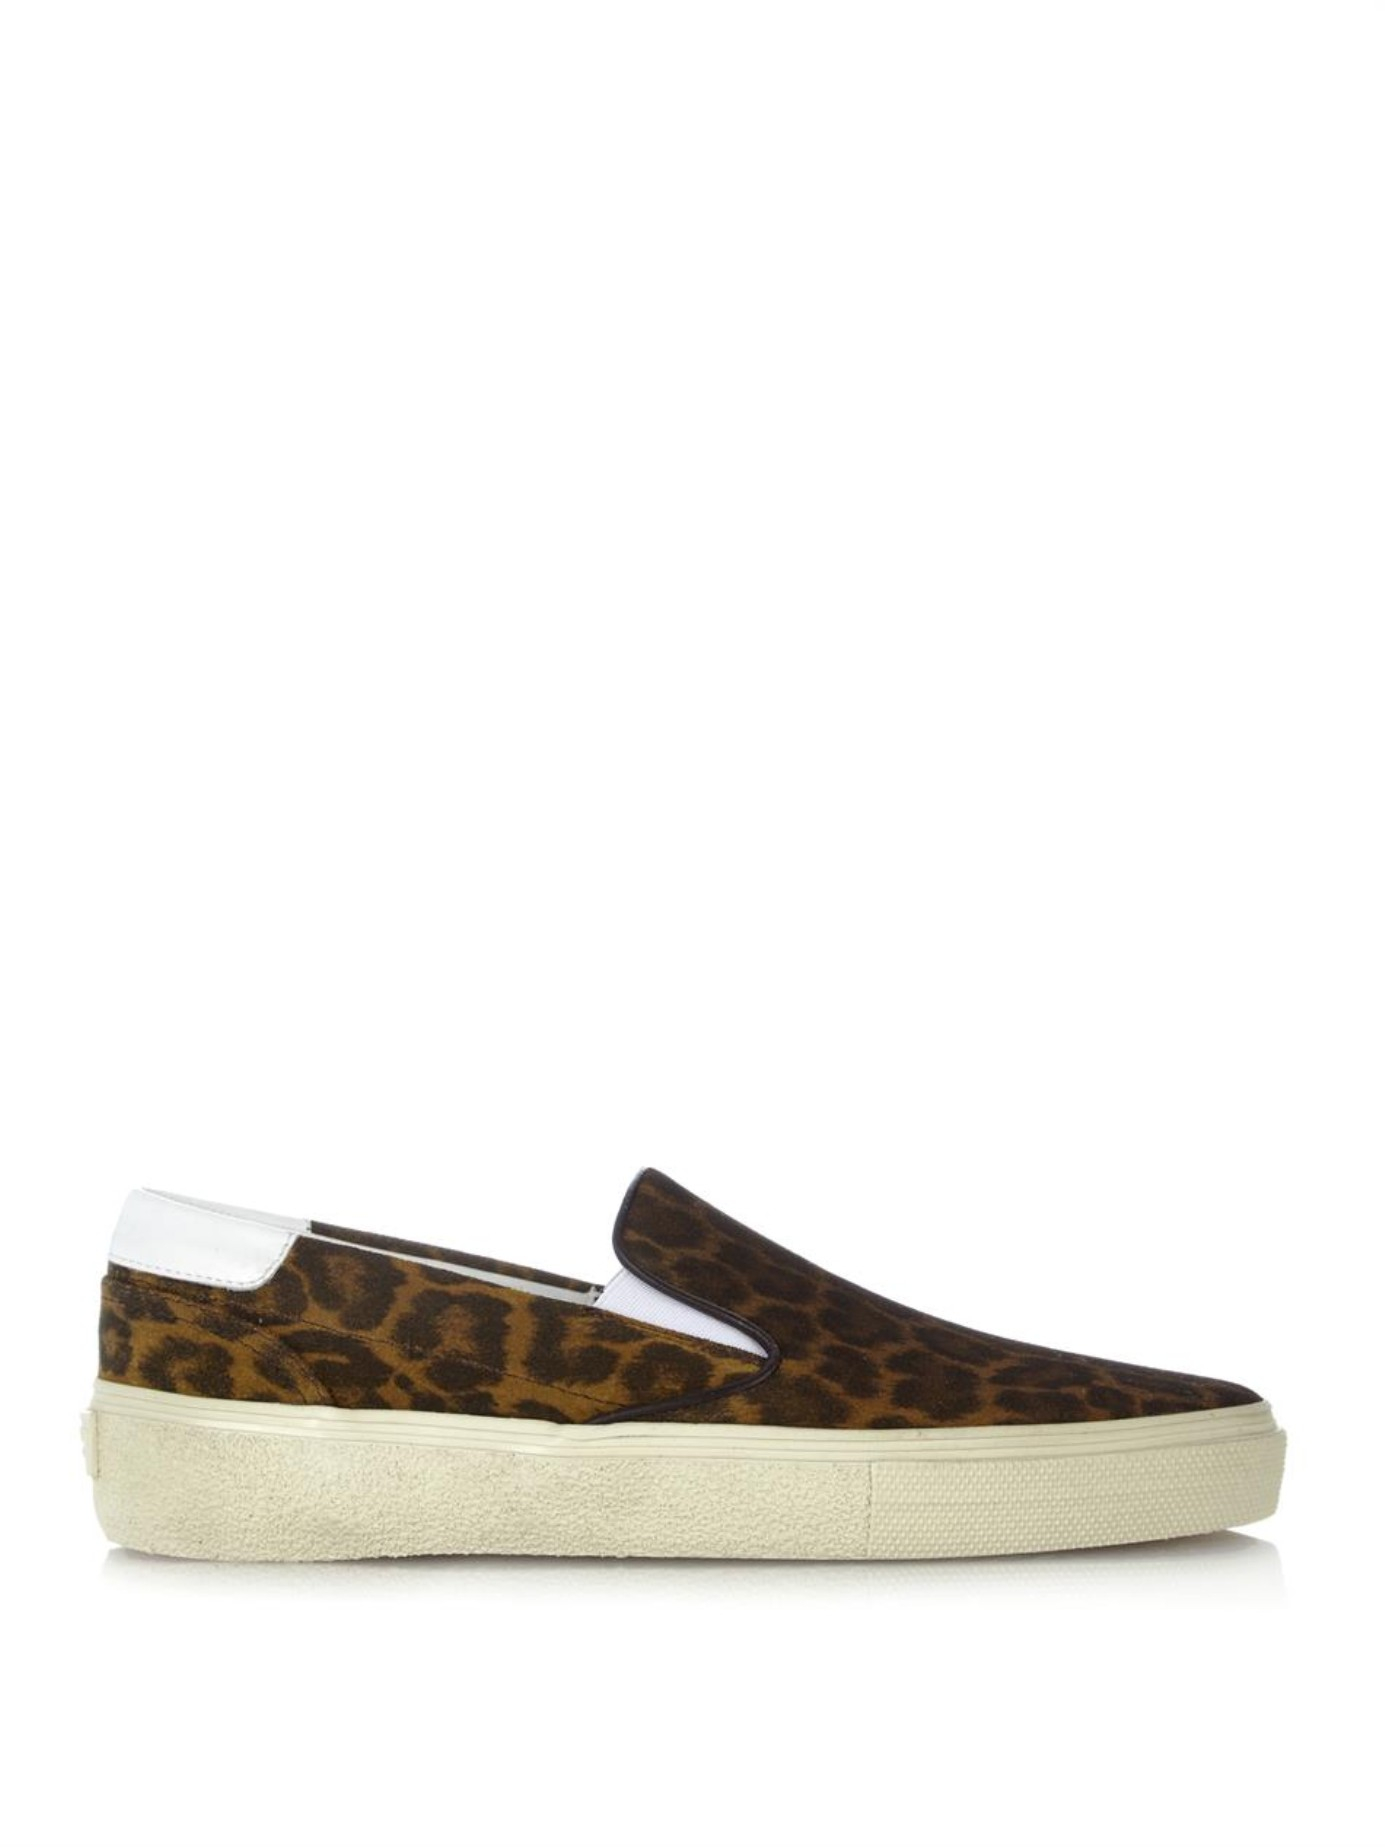 dbc4126b17b Saint Laurent Leopard-Print Suede Skate Sneakers - Lyst